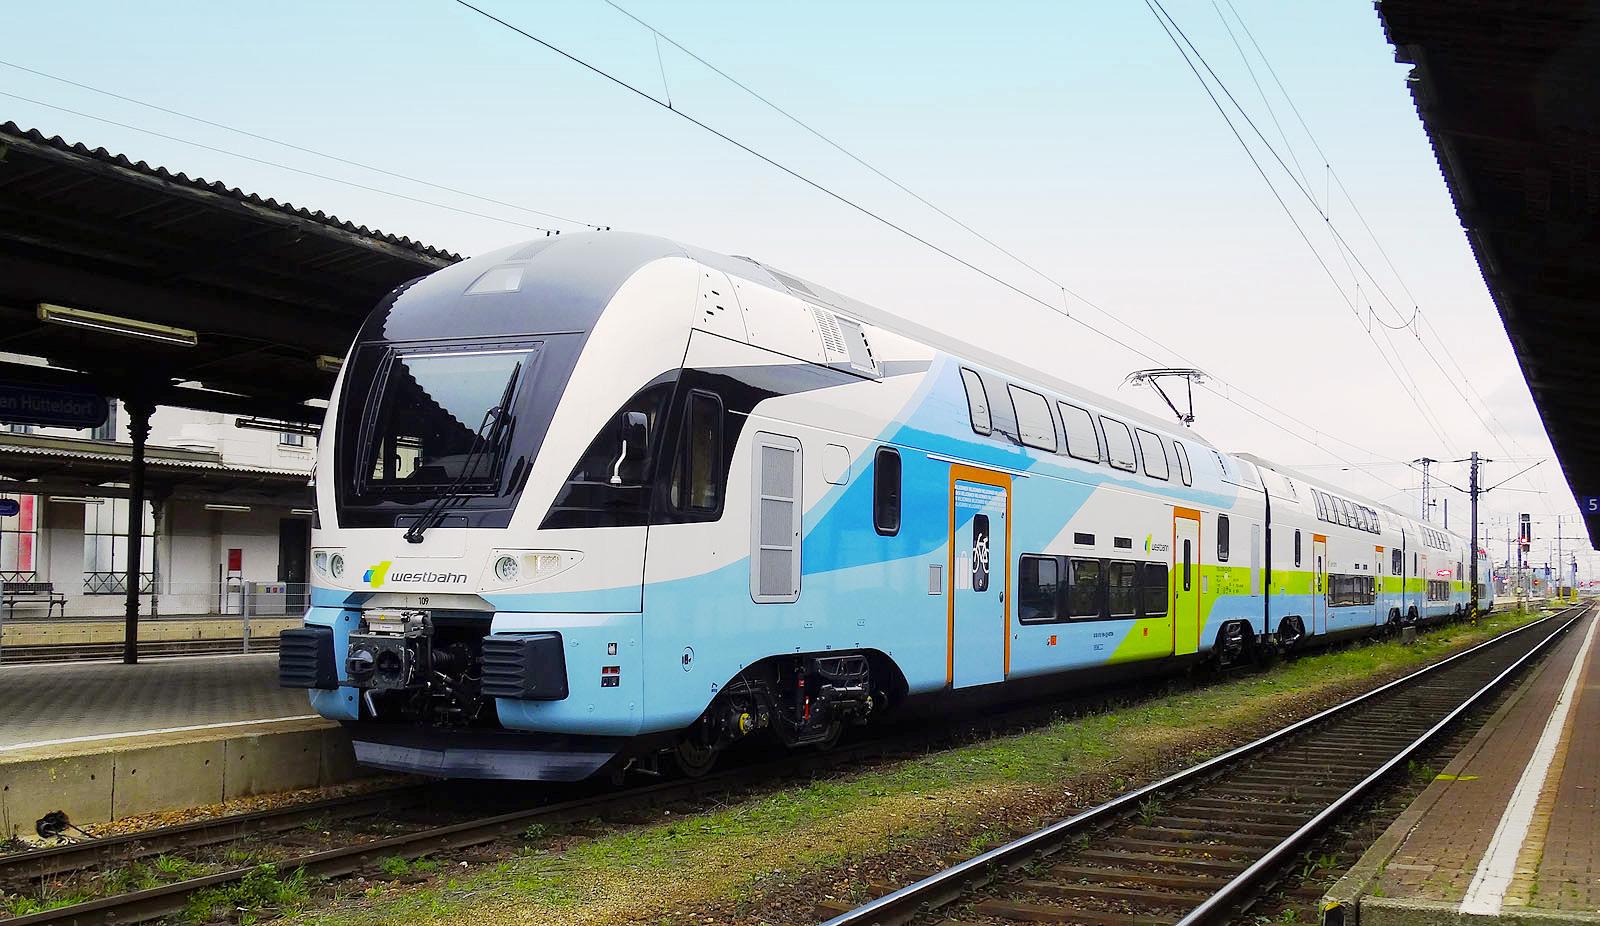 stadler_kiss_westbahn202_herbertpschill